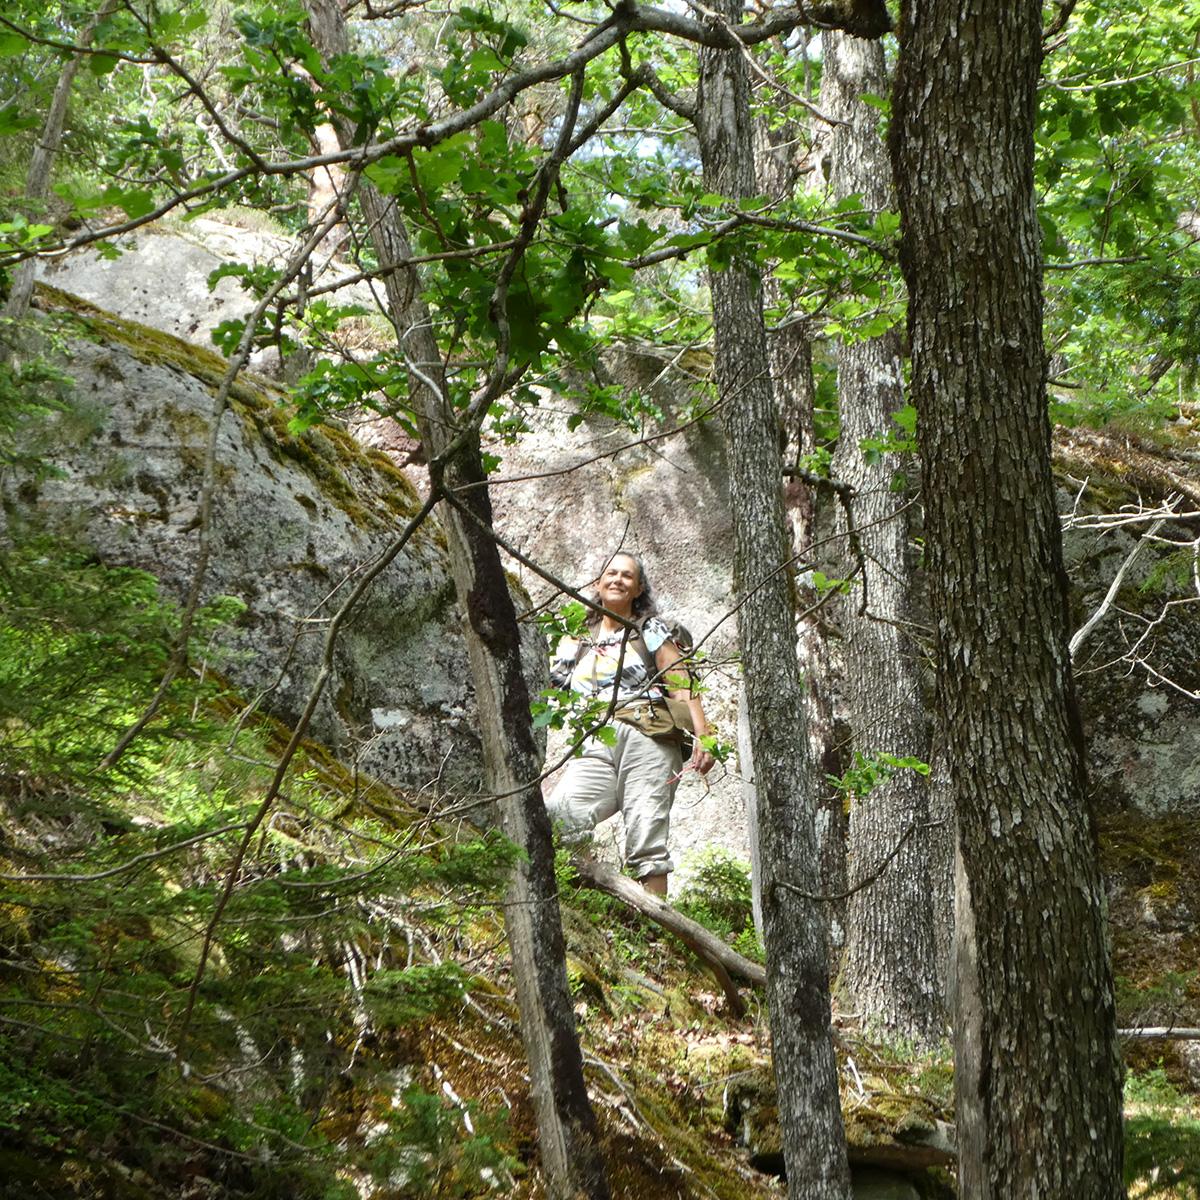 Rekreation i gammelskog ger goda hälsoeffekter